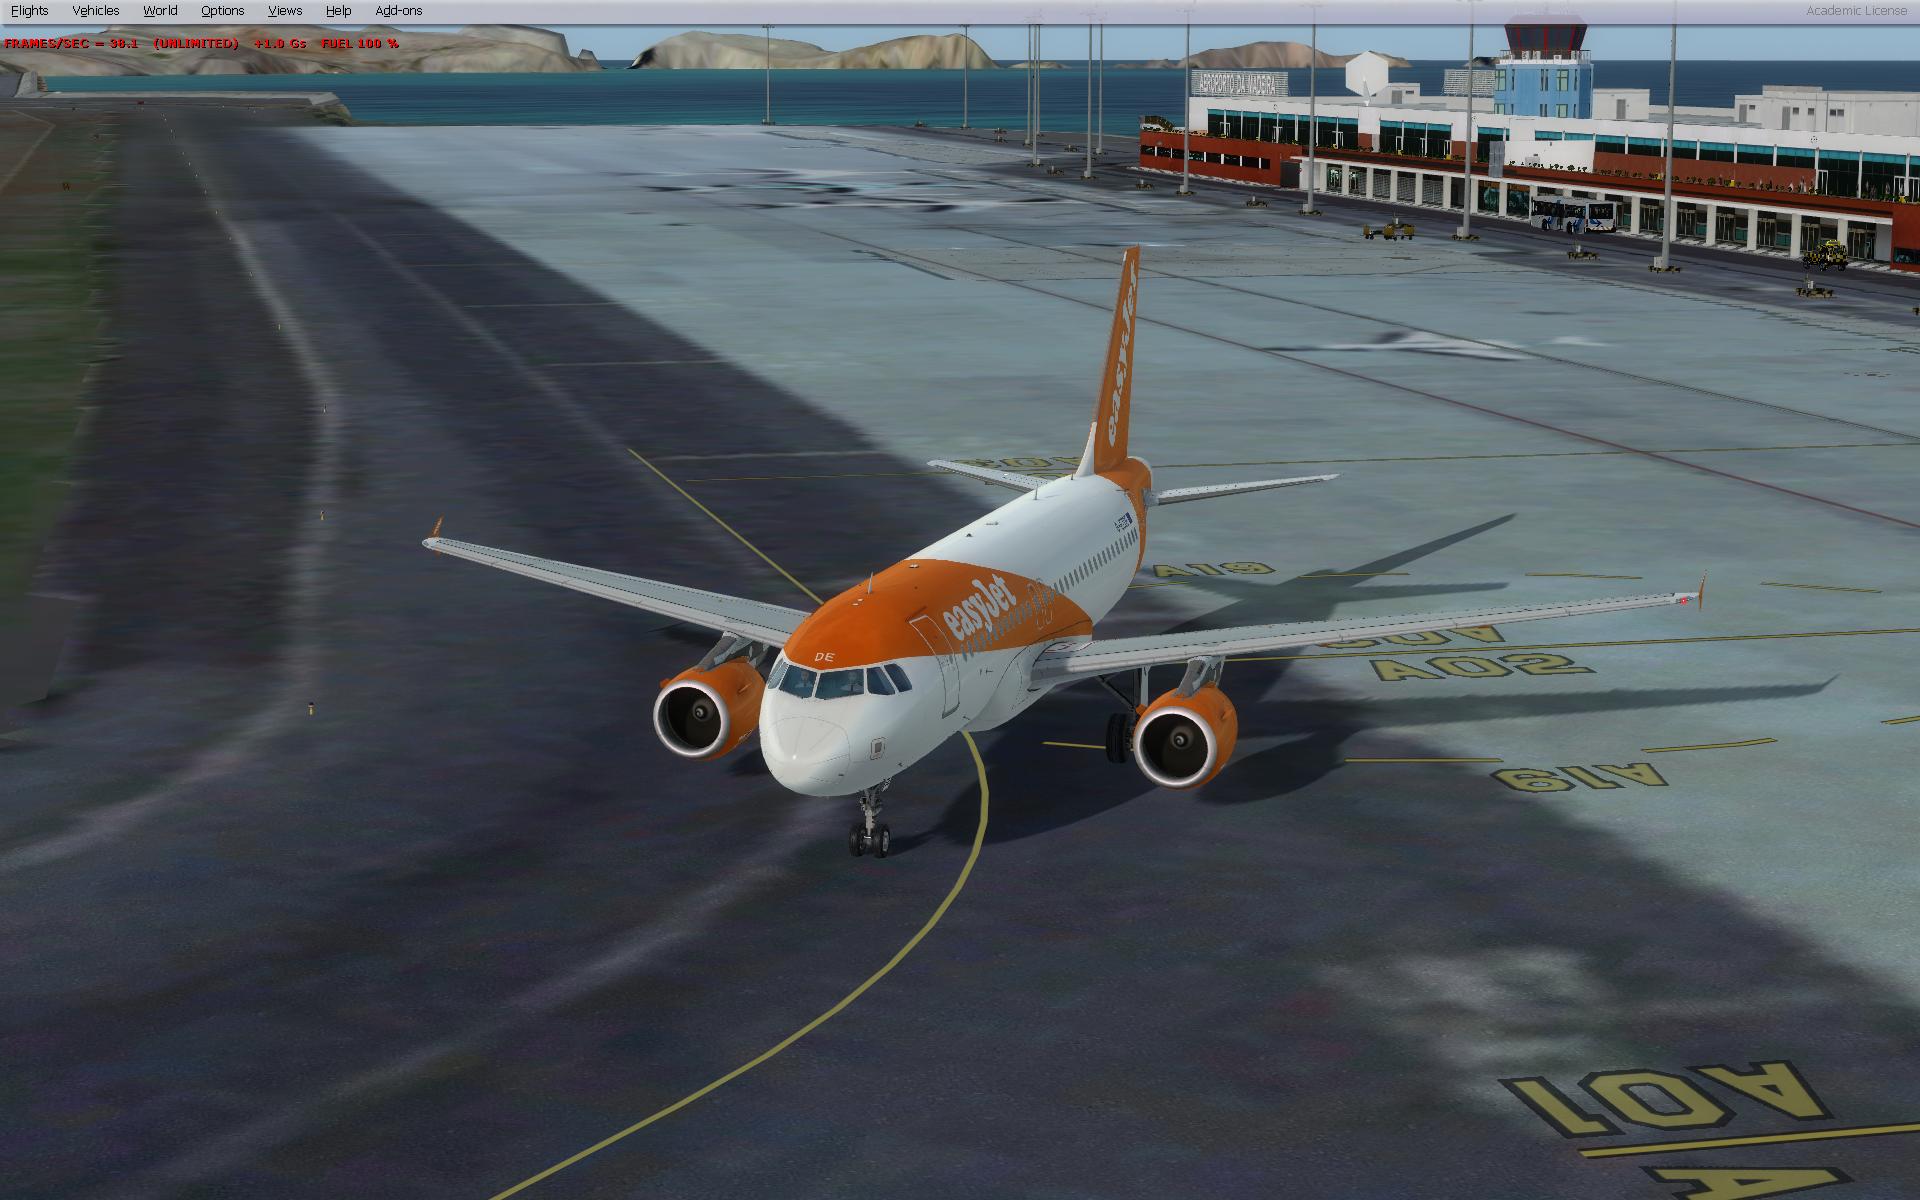 Madeira ground textures are blurry/broken (P3D v2 5) - Aerosoft